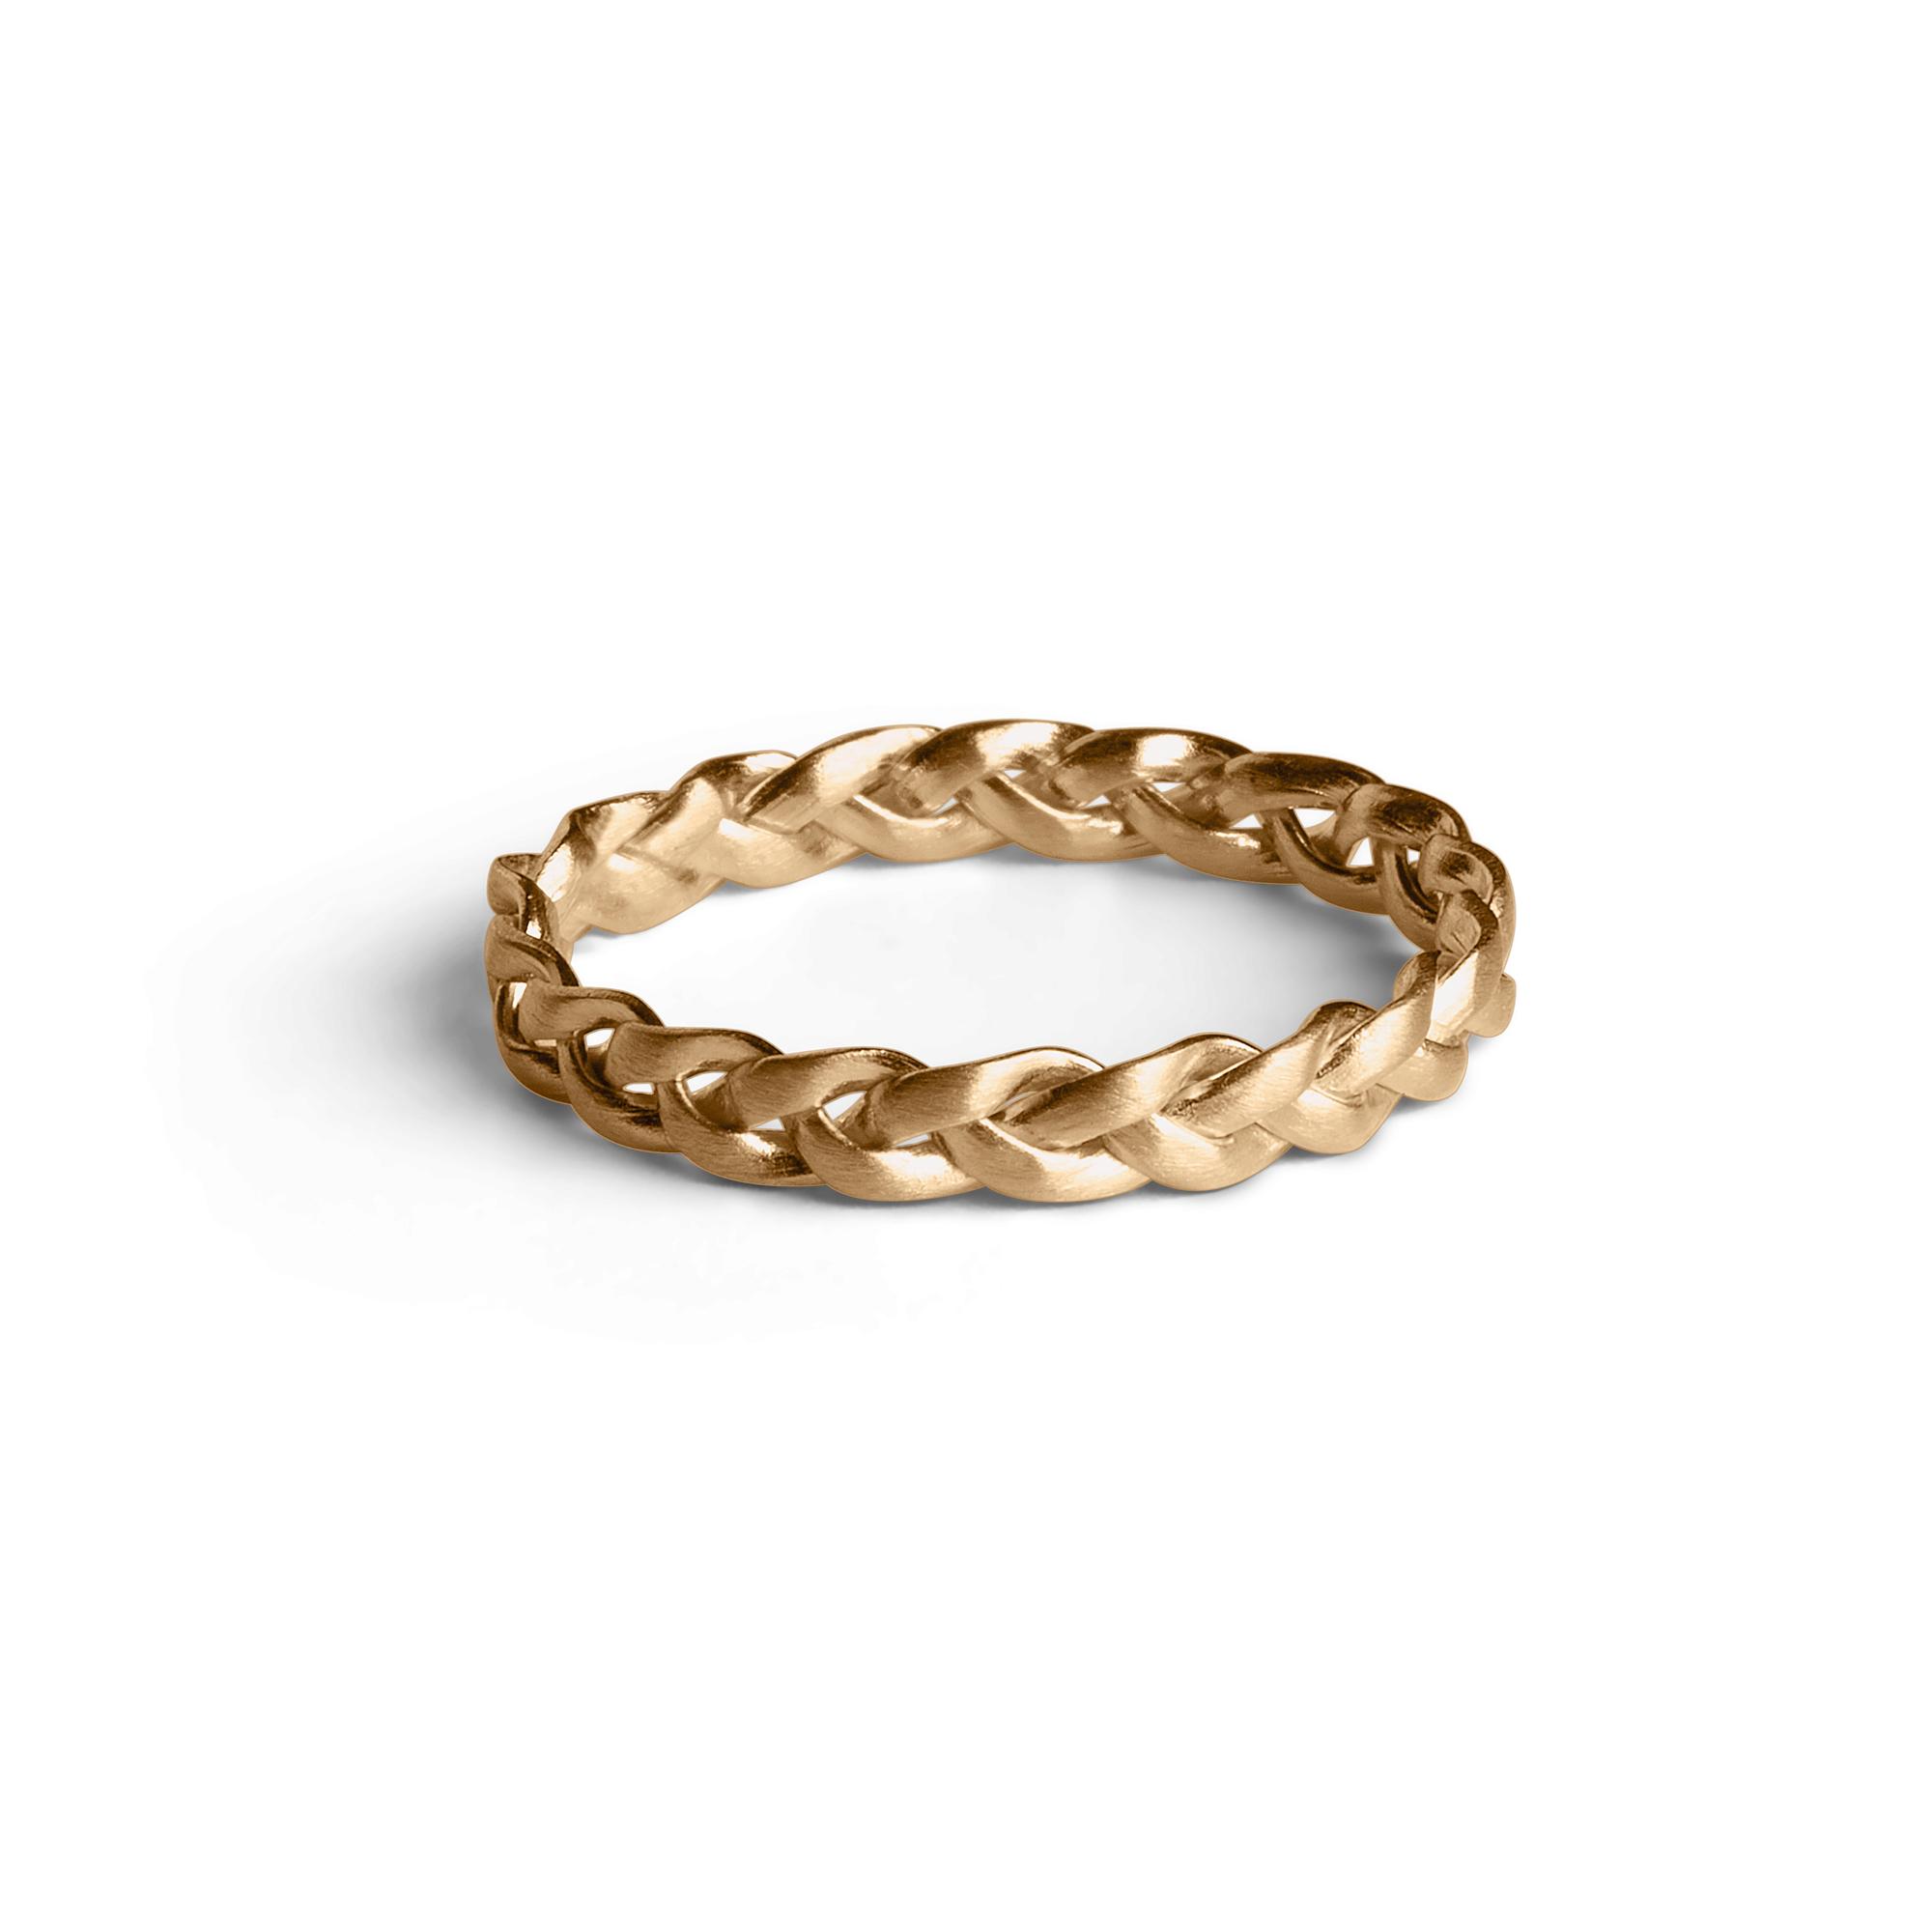 Jane Kønig small Braided ring